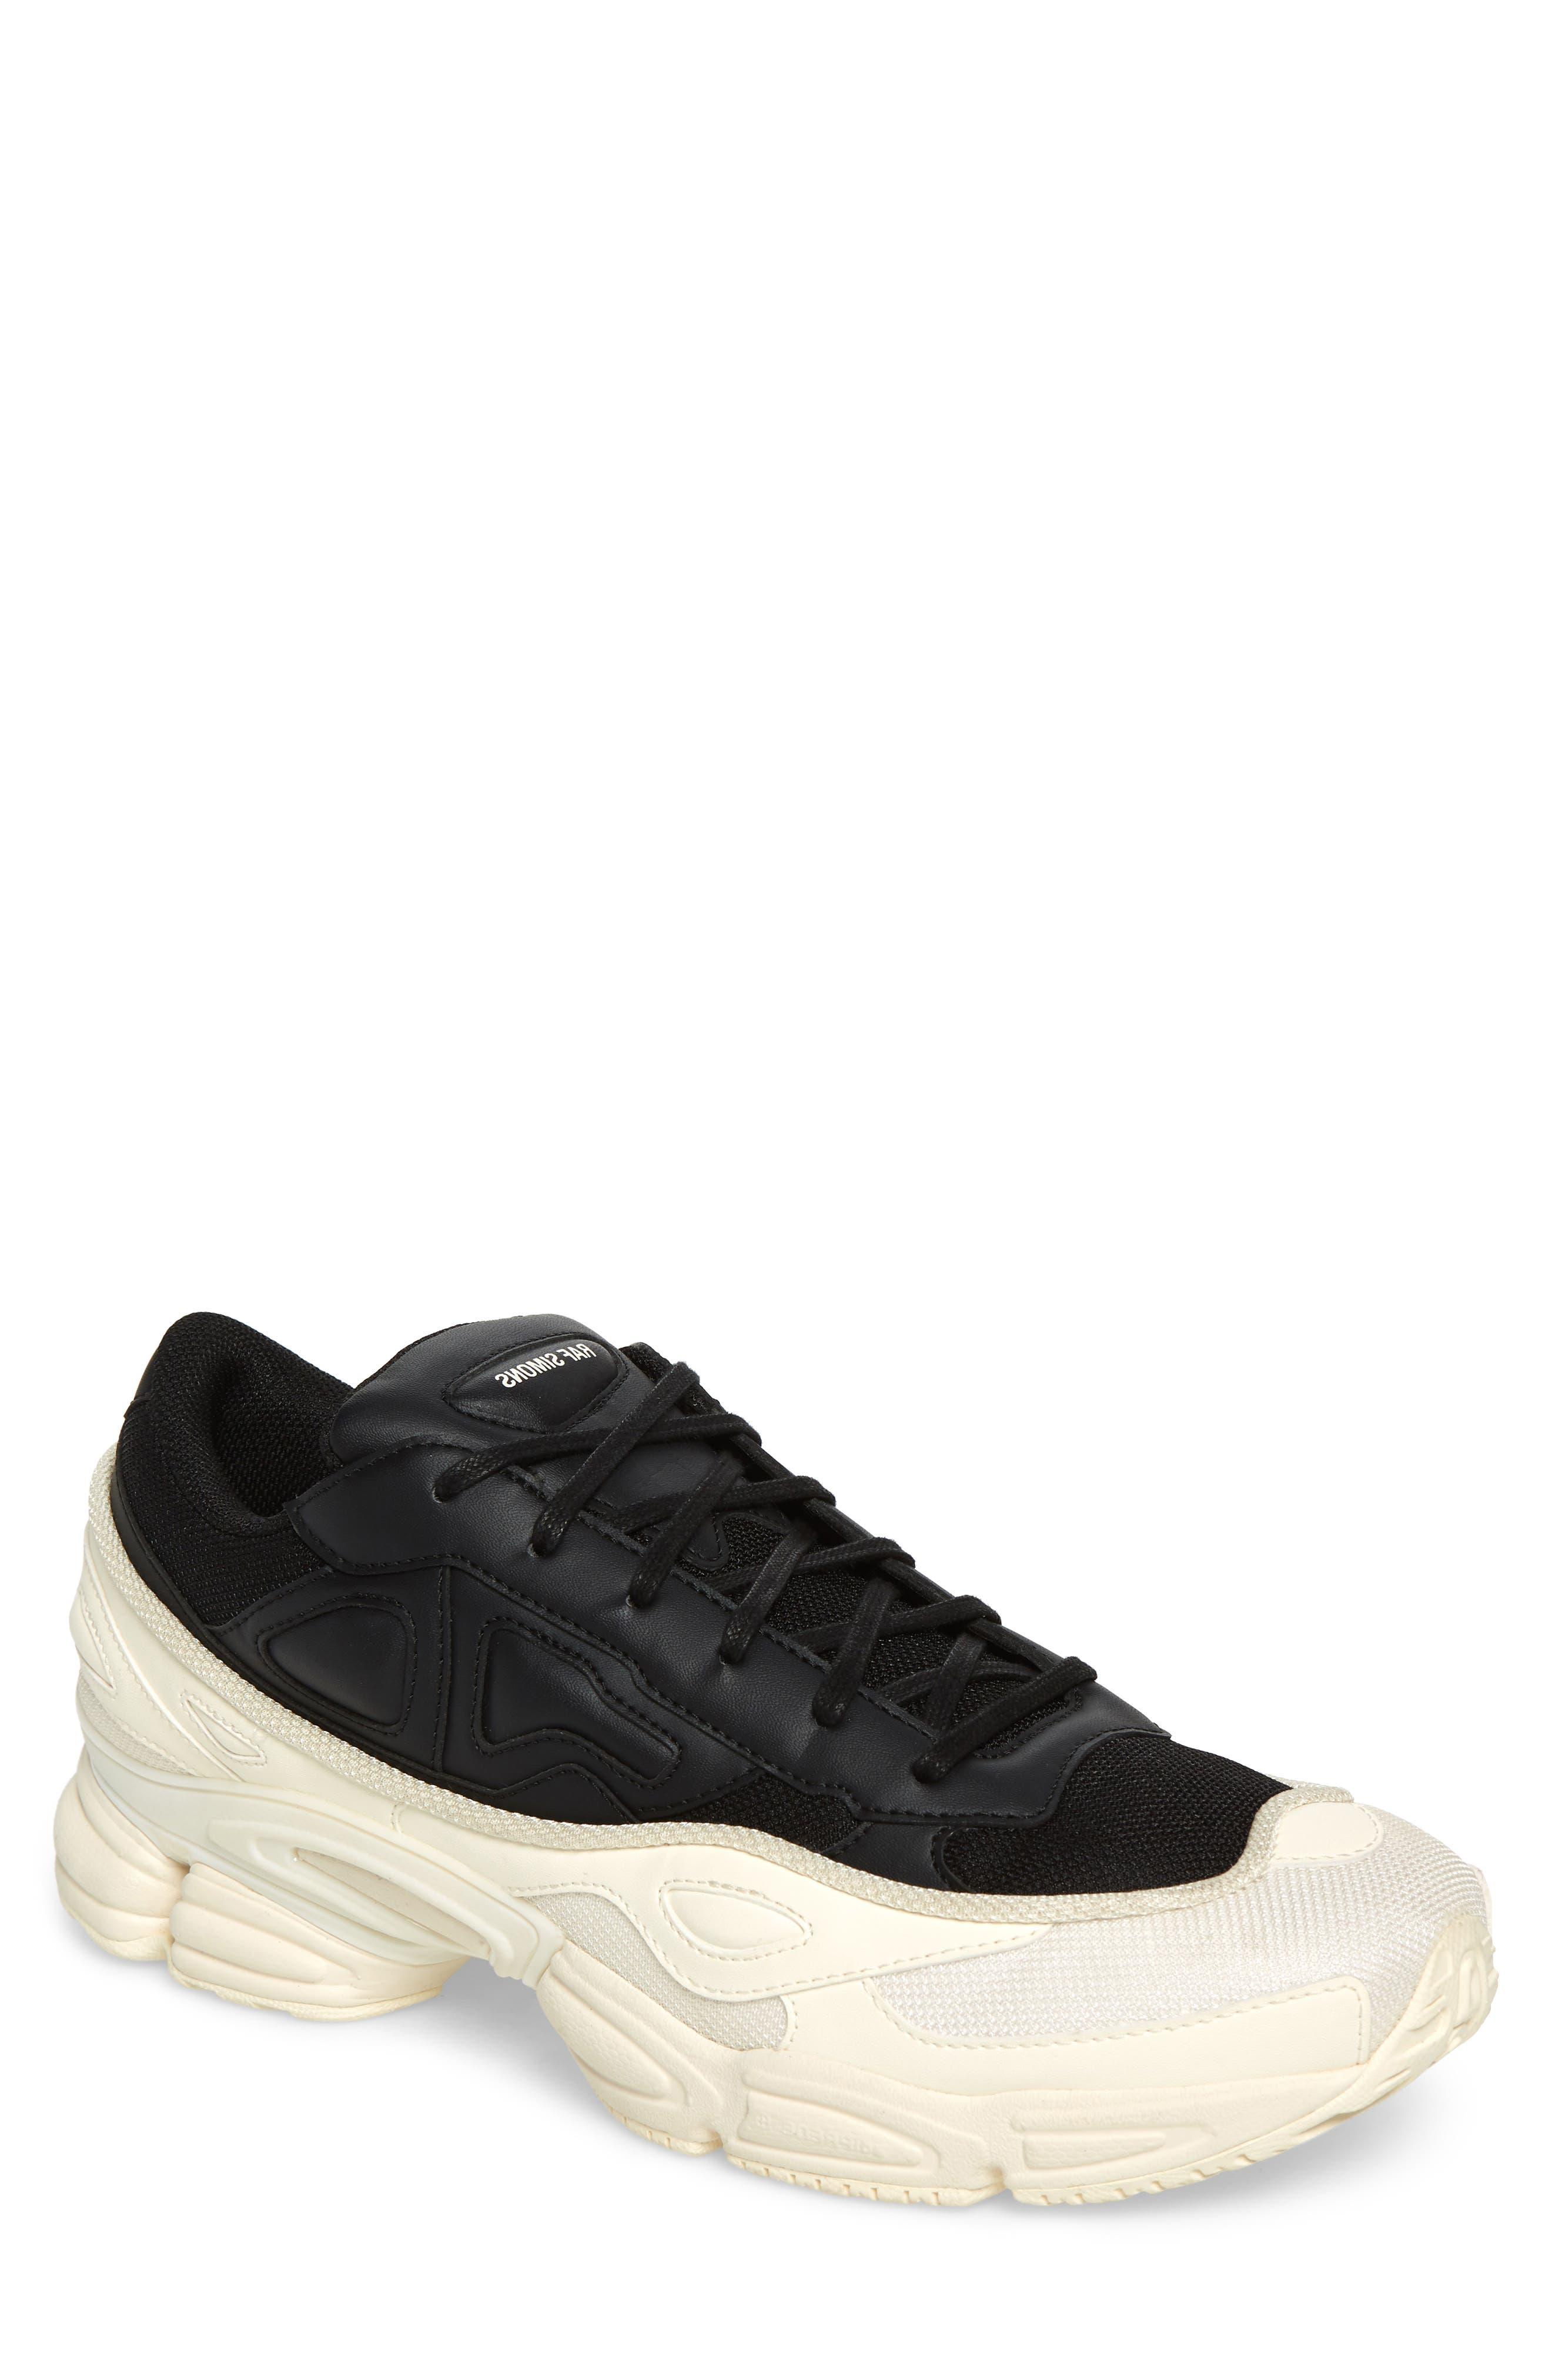 adidas by Raf Simons Ozweego III Sneaker,                         Main,                         color, CREAM WHITE/ CORE BLACK